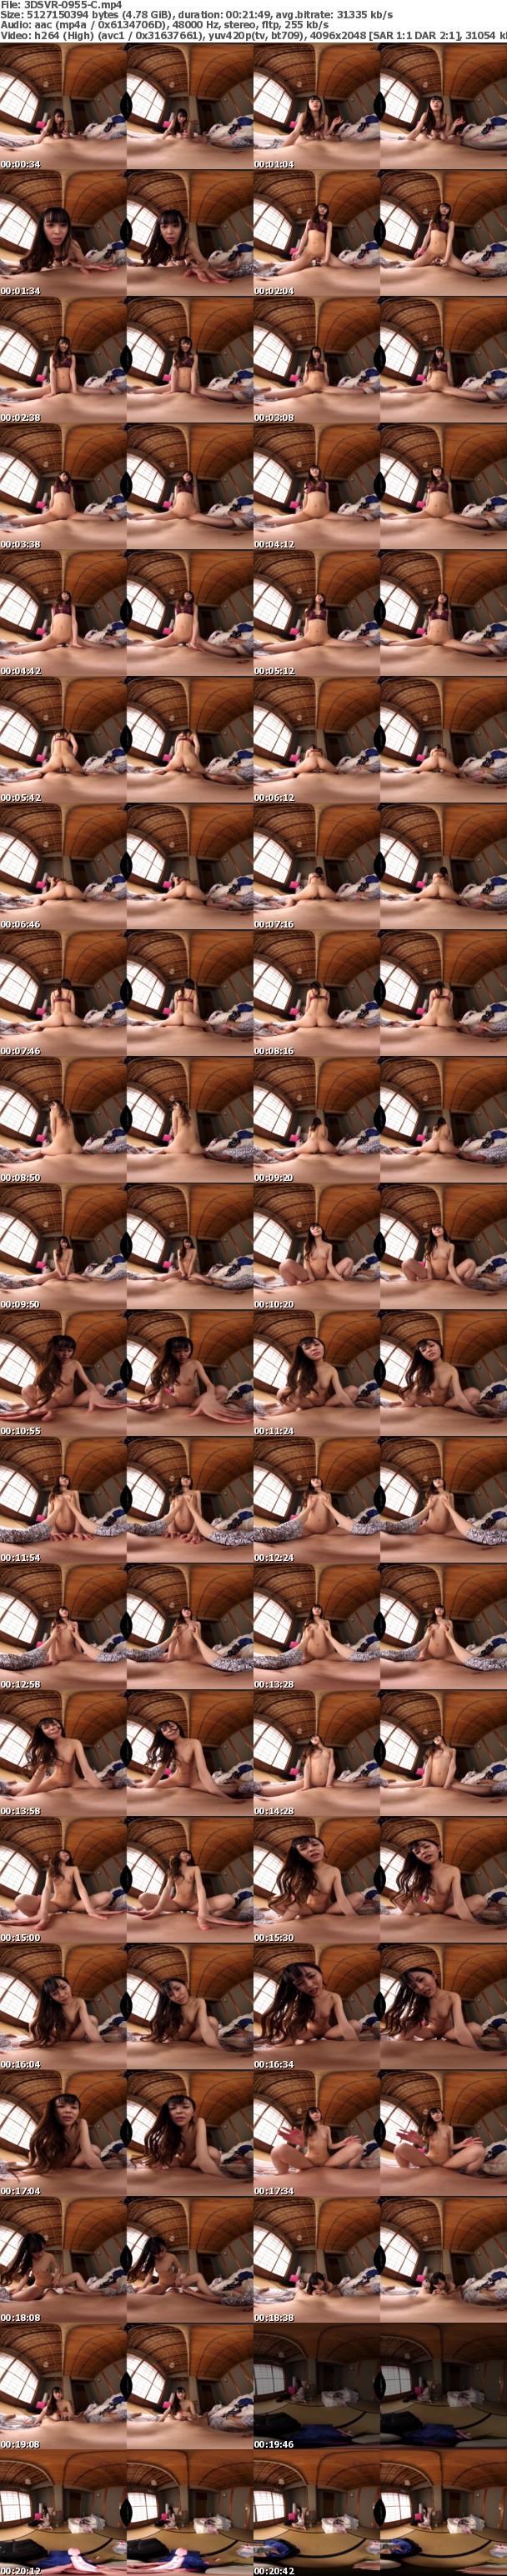 (VR) 3DSVR-0955 初めての温泉旅行でドS彼女をイカせたい!…の予定が倍返し痴女モードで一滴残らず精子を絞り取られてヤラれまくった僕…。 柊木楓